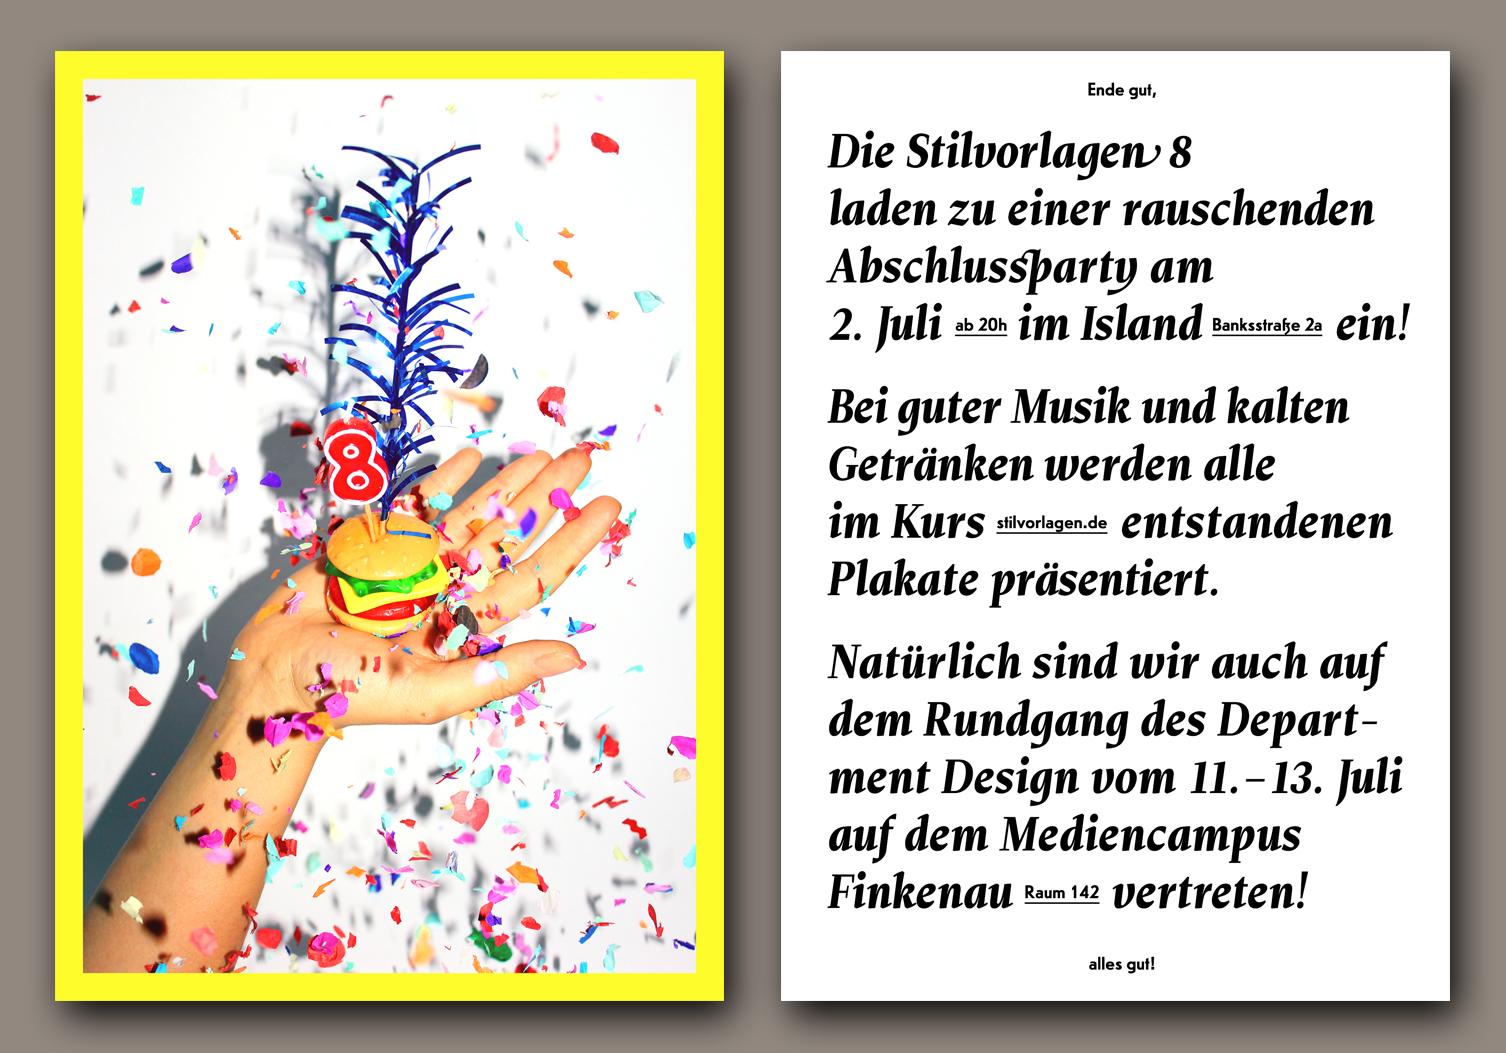 Miscellaneous ⇝ Artur Neufeld